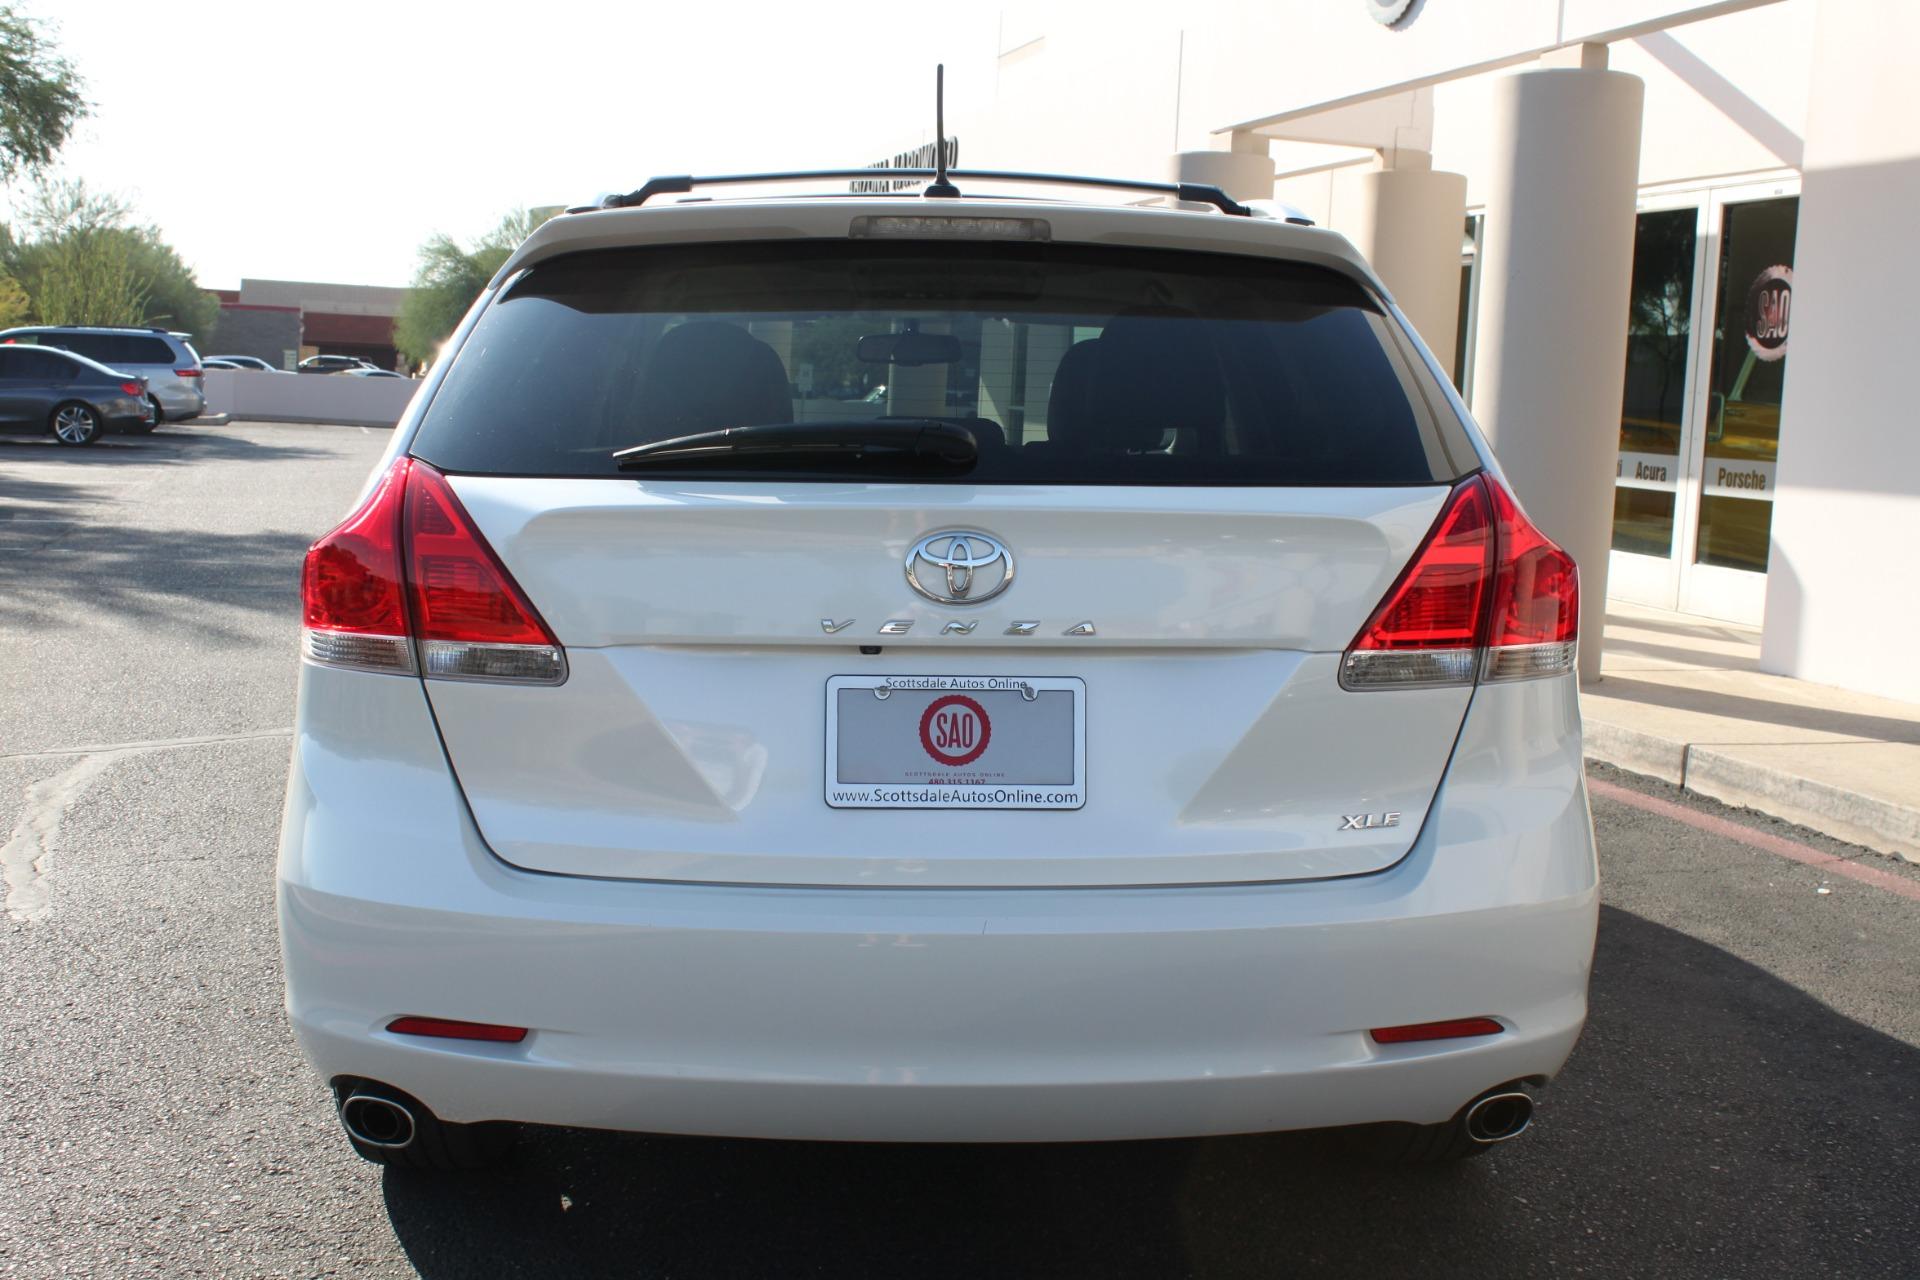 Used-2012-Toyota-Venza-XLE-Mopar